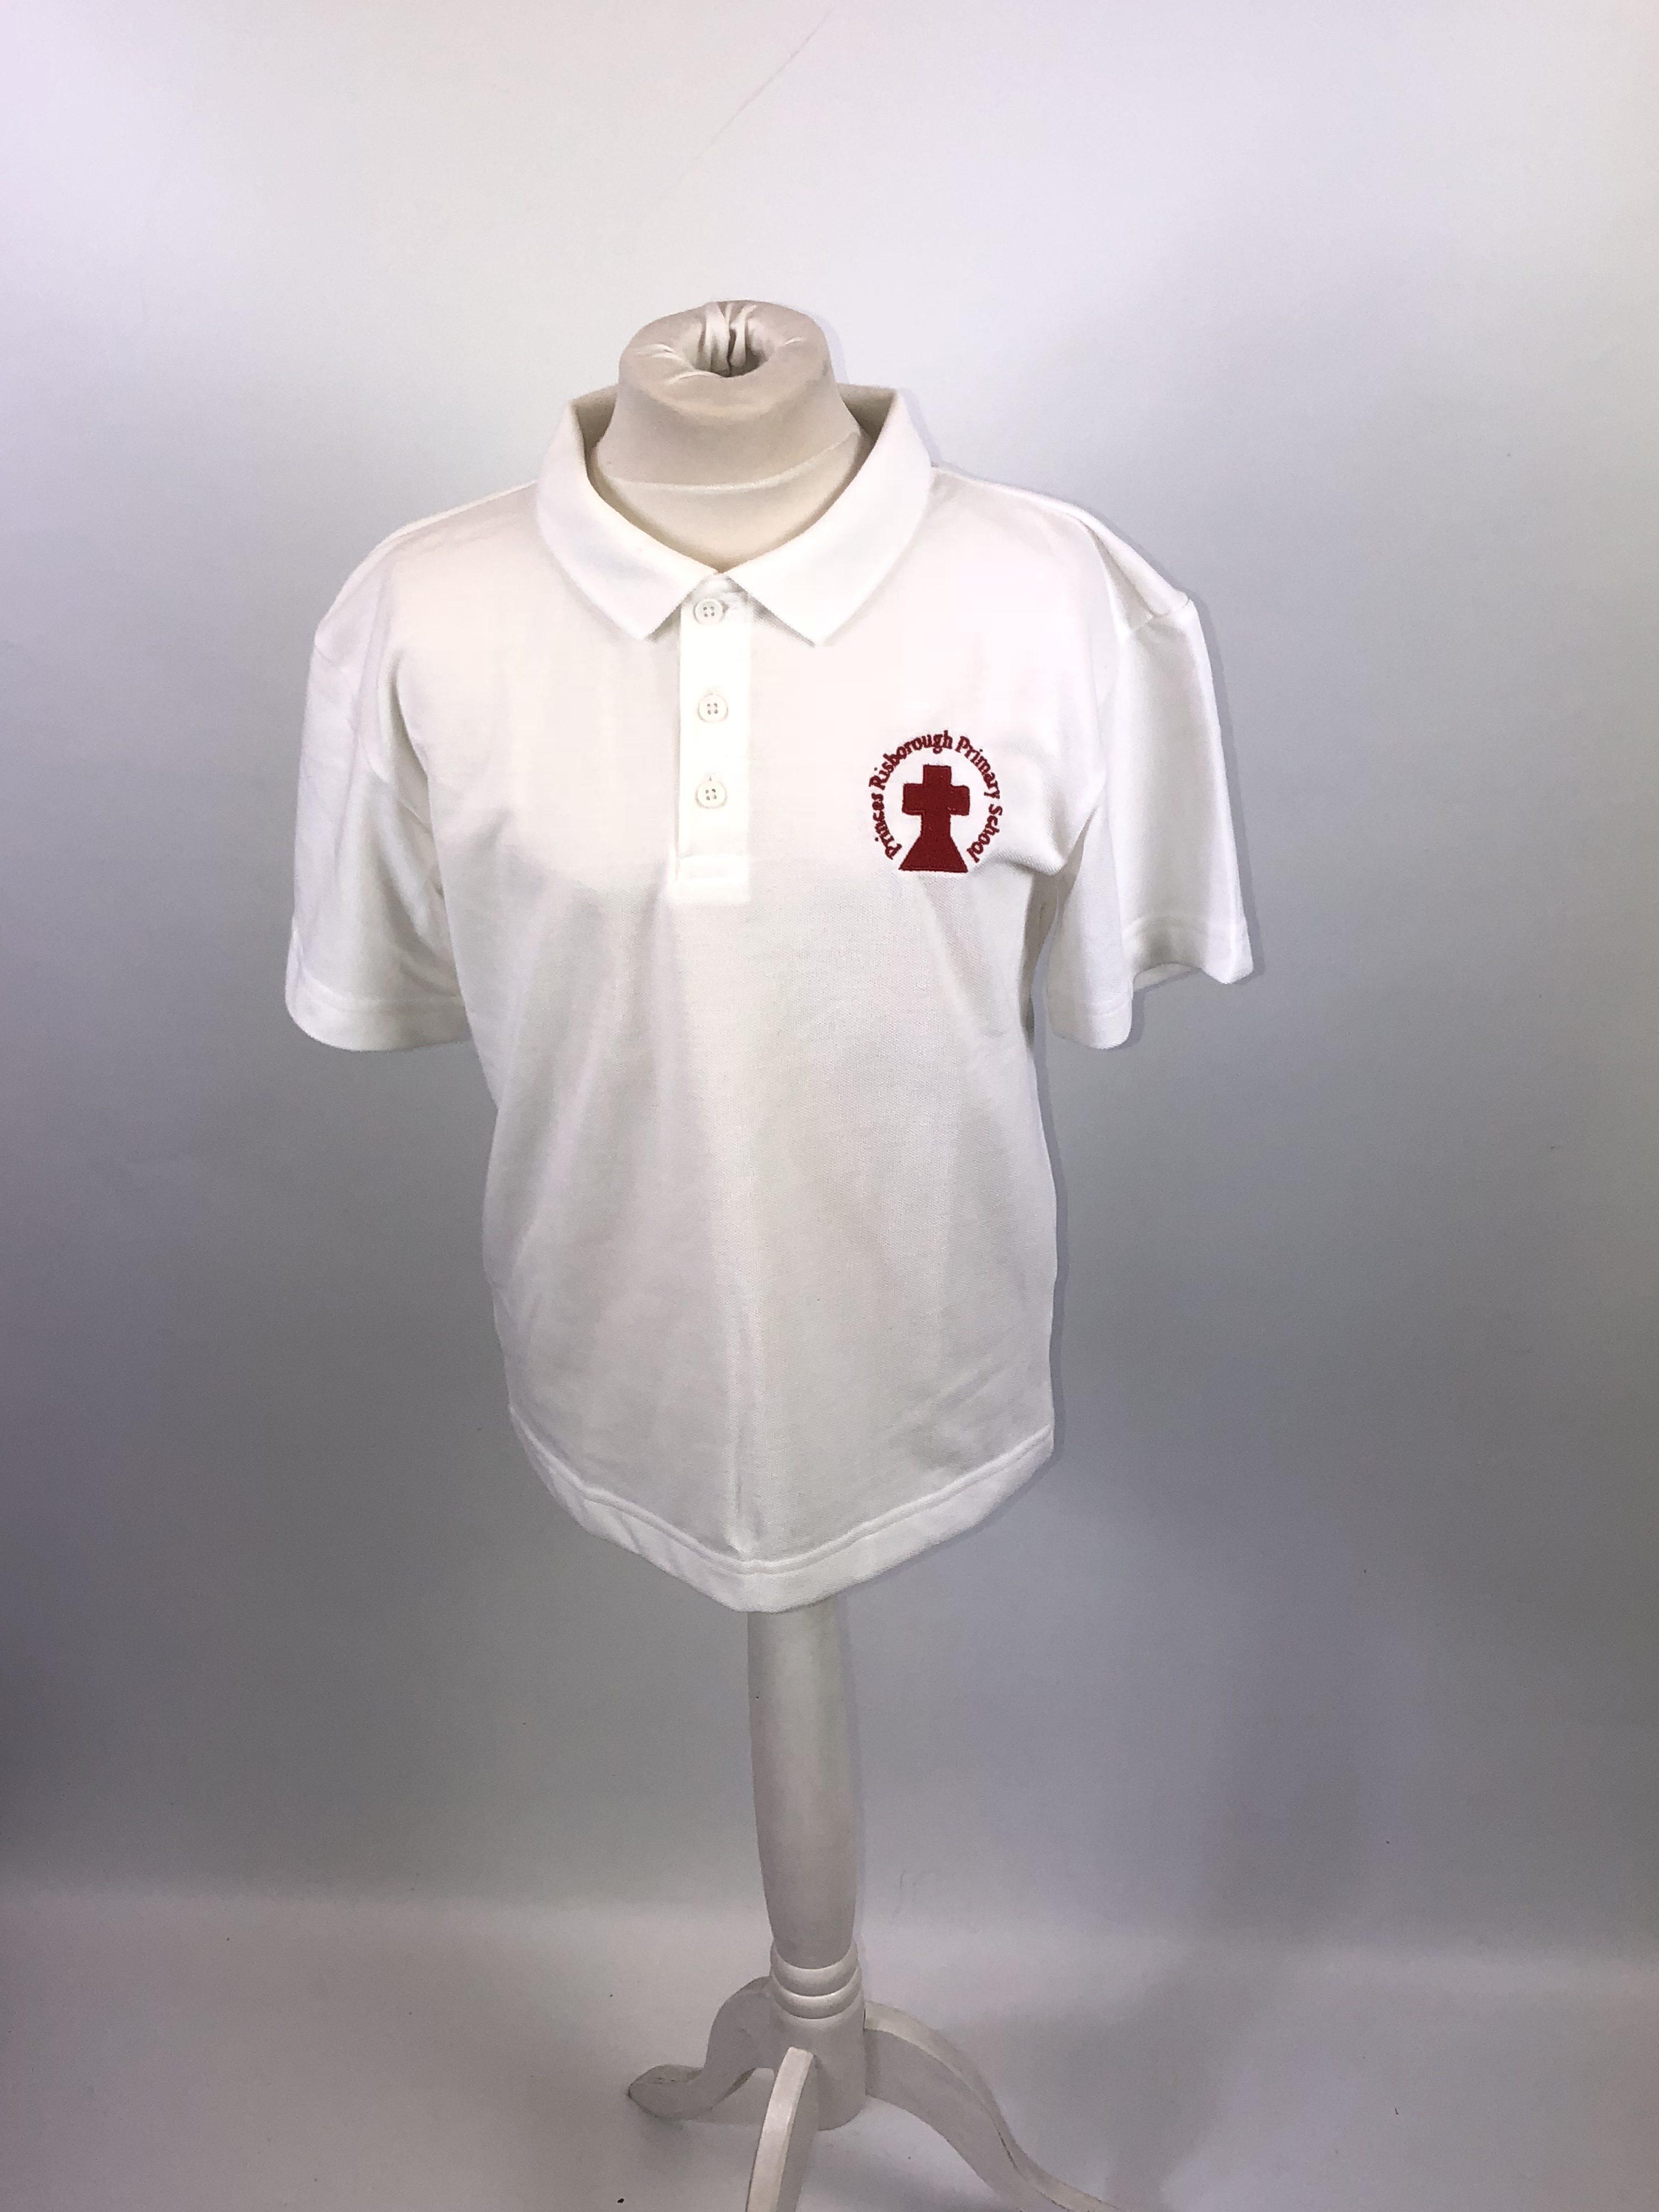 billig AliExpress samlede op Princes Risborough - White Polo Shirt